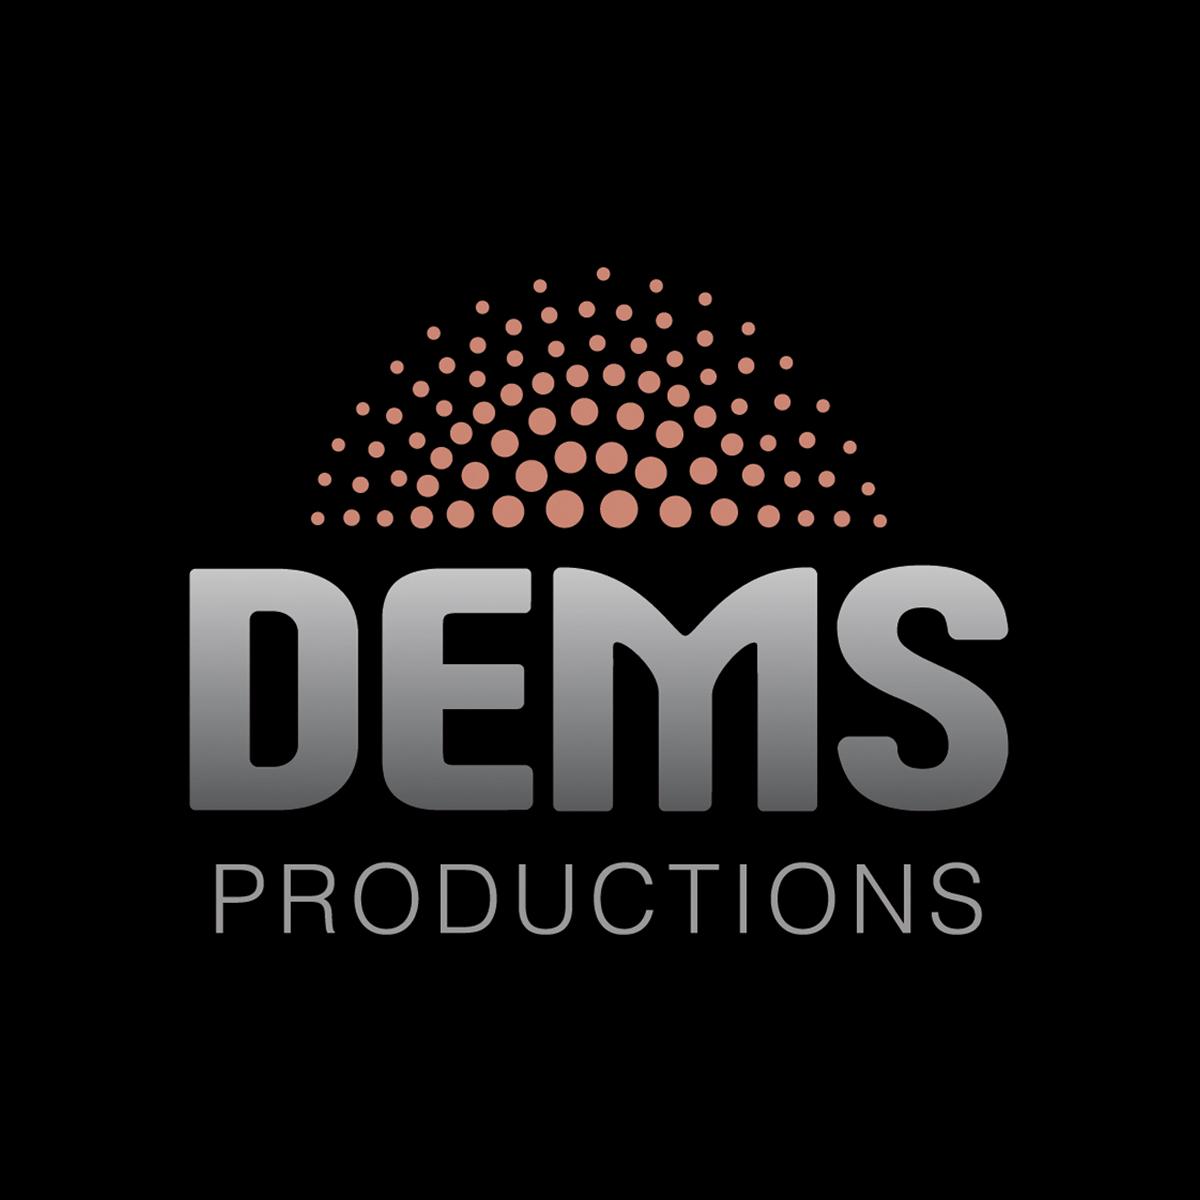 Dems Production Canberra Logo Design